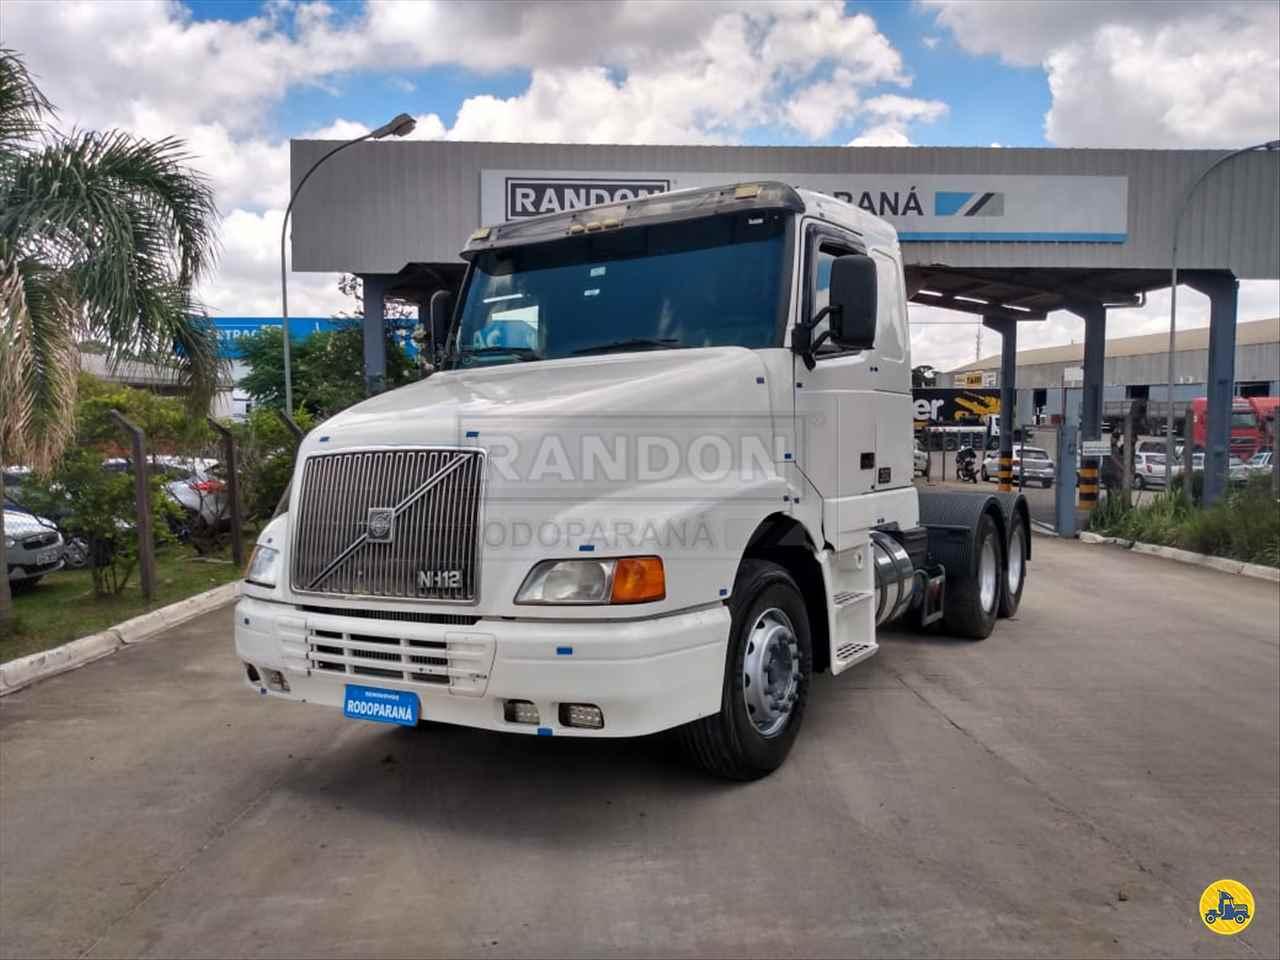 CAMINHAO VOLVO VOLVO NH12 380 Cavalo Mecânico Truck 6x2 Rodoparana - RANDON Curitiba CURITIBA PARANÁ PR